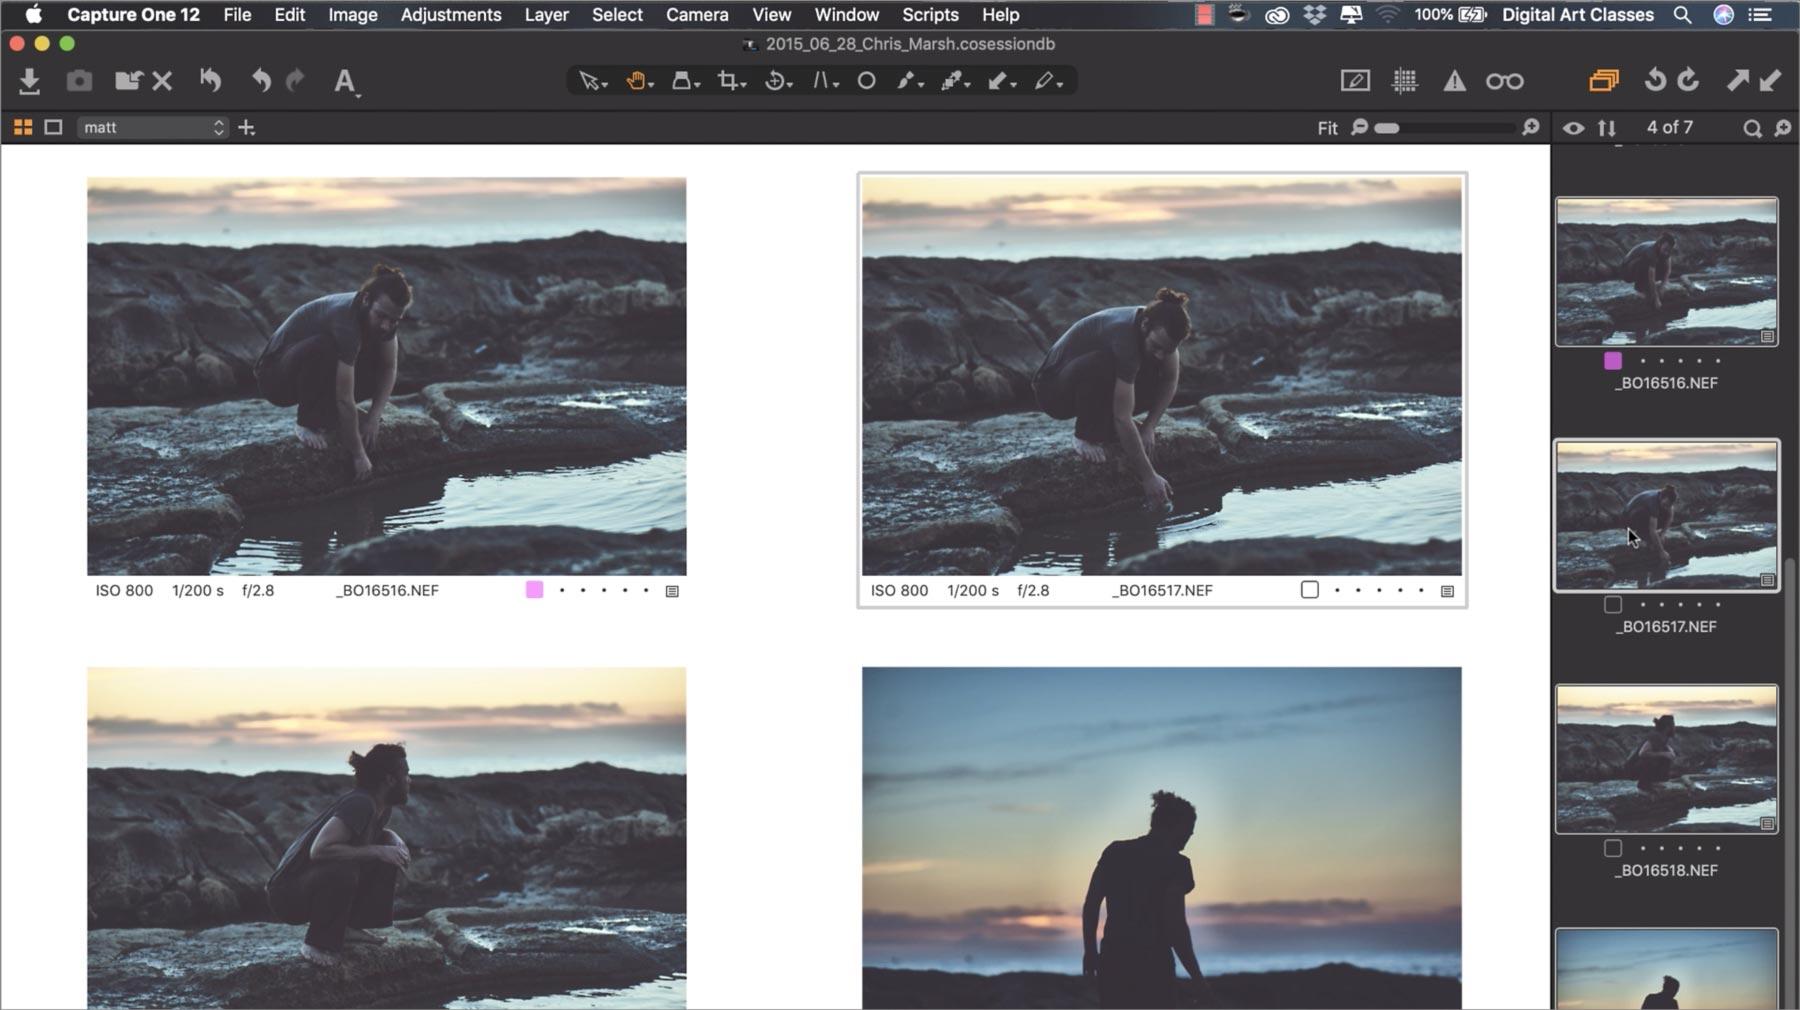 Complete Photo Edit: Chris Part 2, Marsascala sunrise